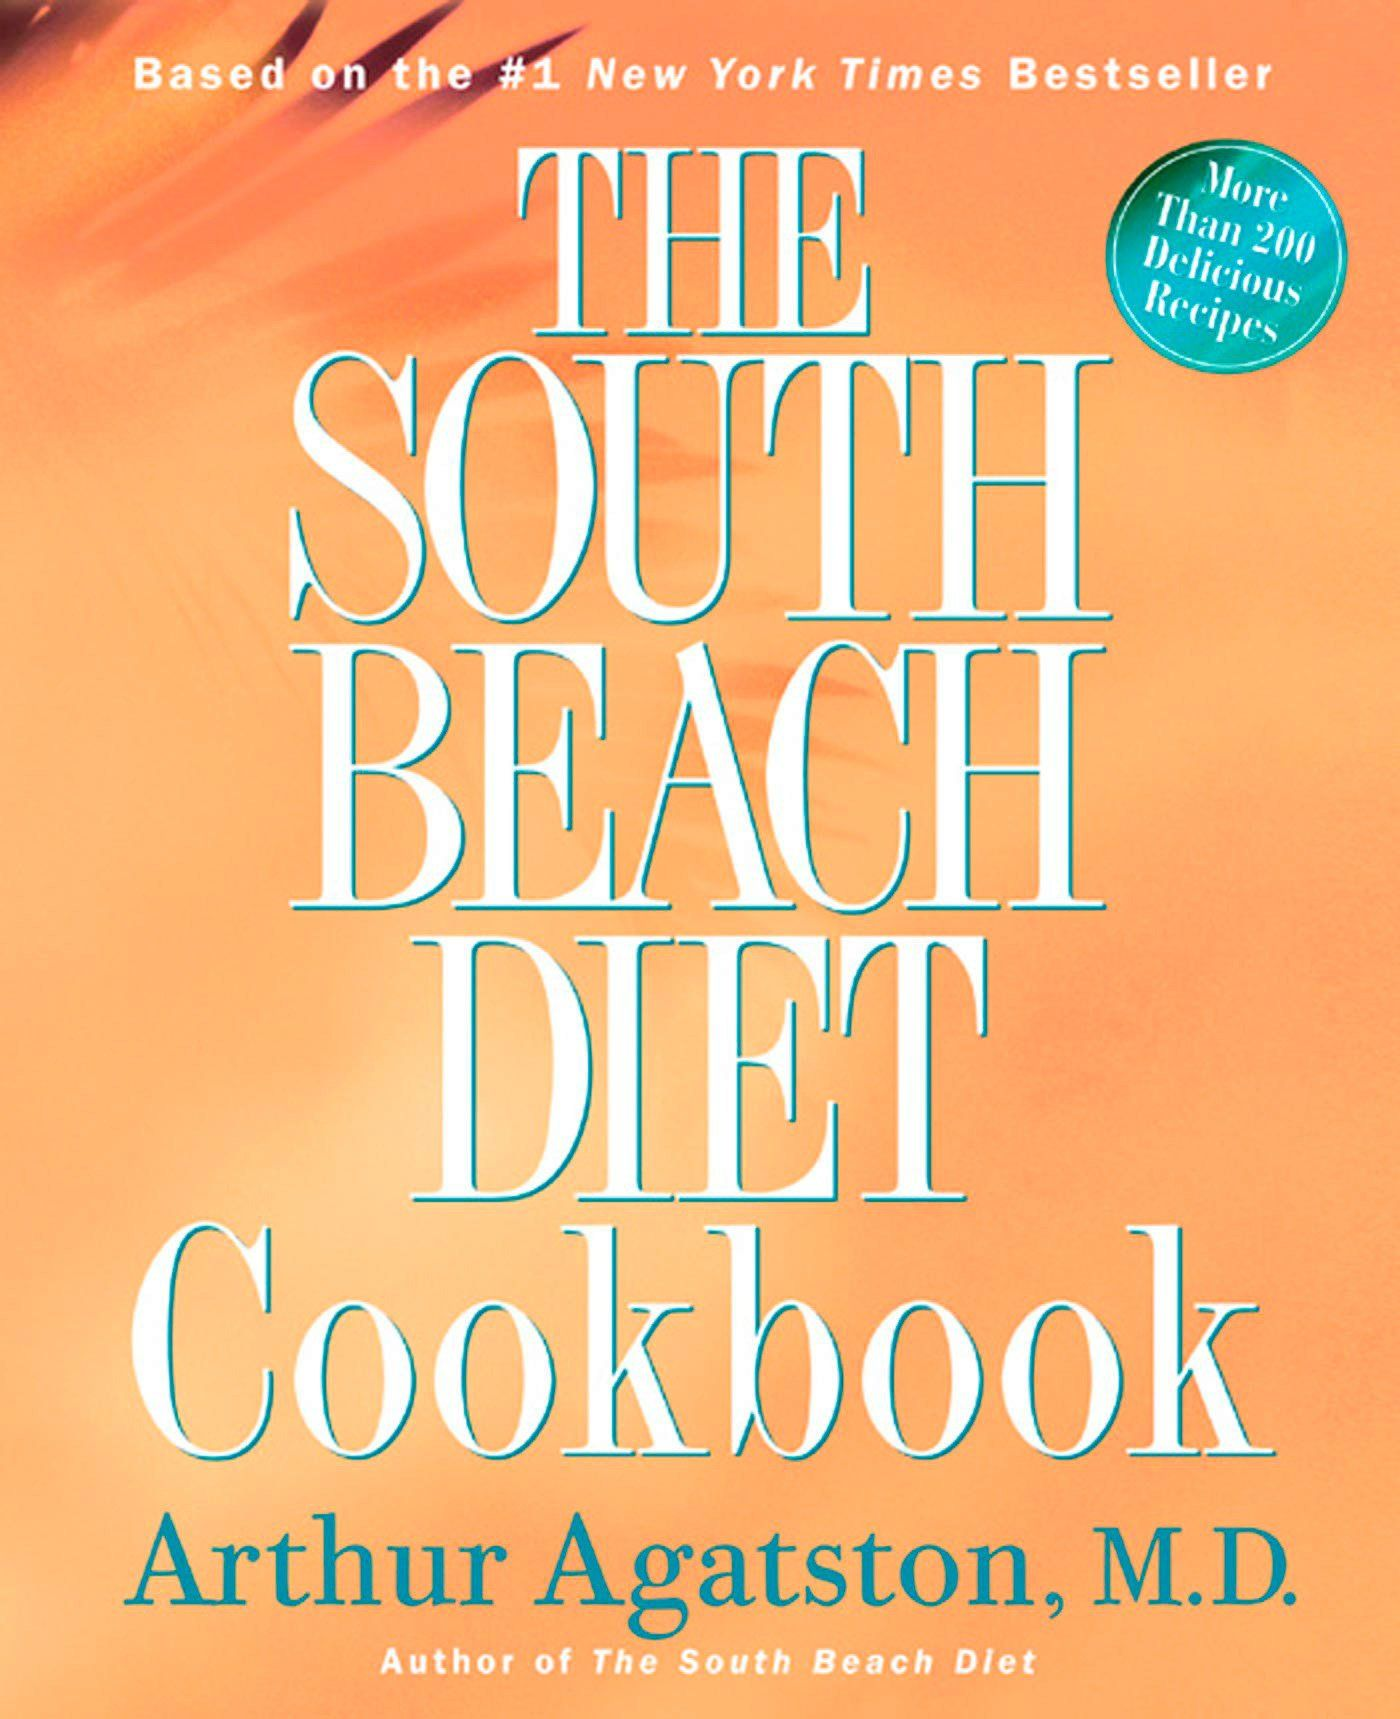 53 Printable South Beach Diet Phase 1 Meal Plan Pdf In 2020 South Beach Diet South Beach Diet Recipes South Beach